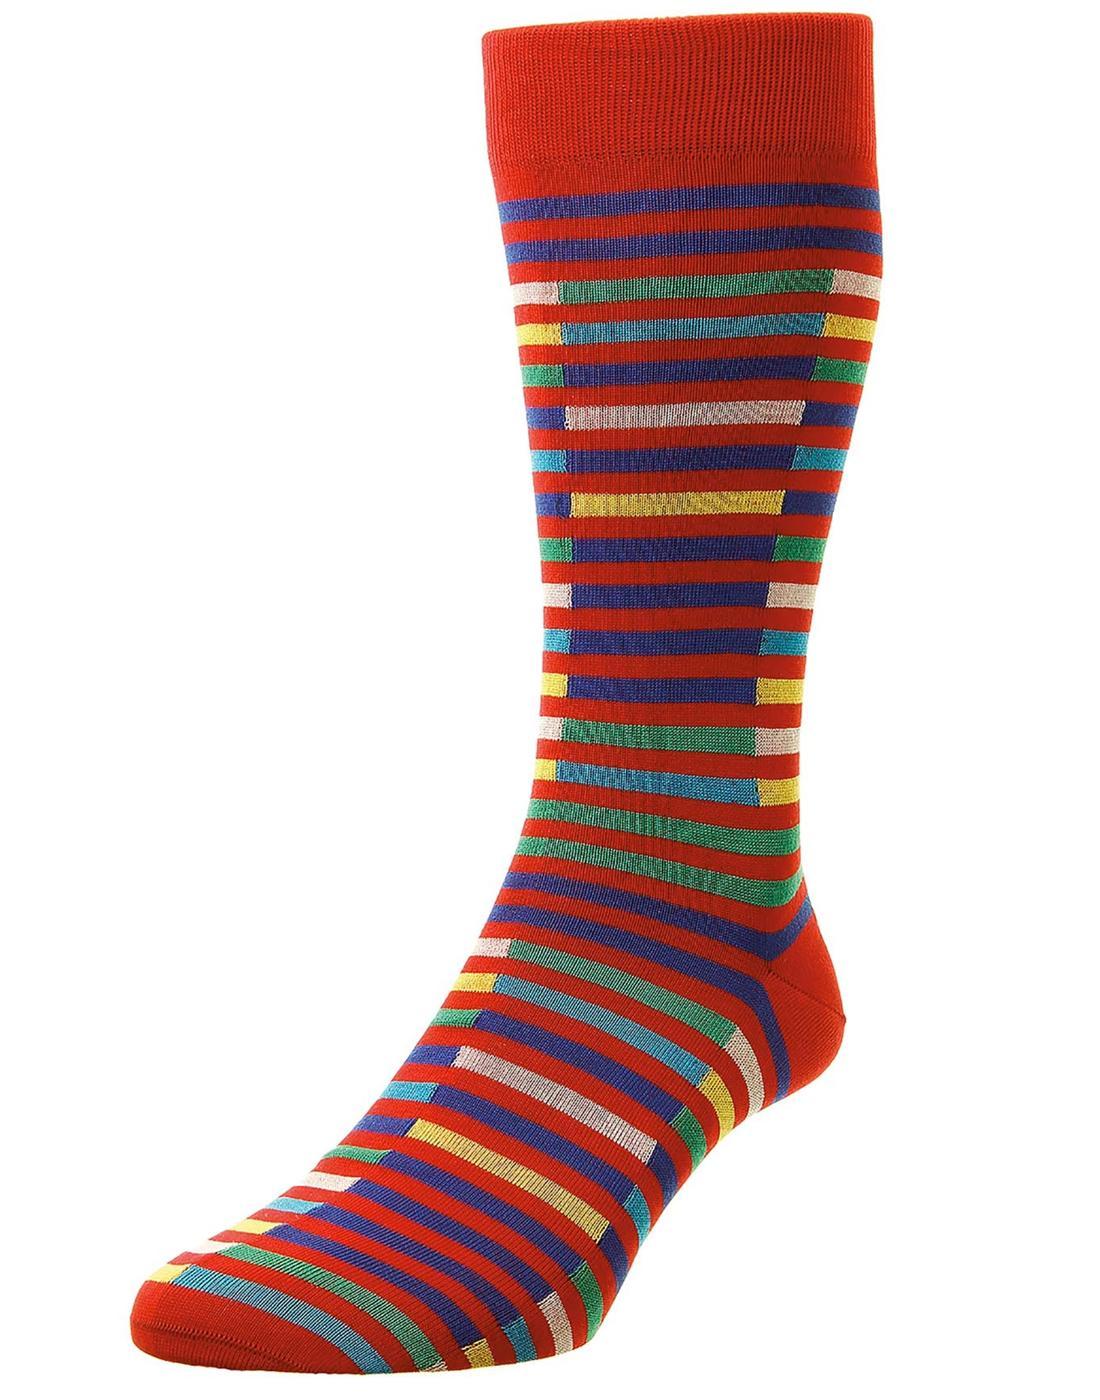 + Bahama PANTHERELLA Men's Broken Stripe Socks S